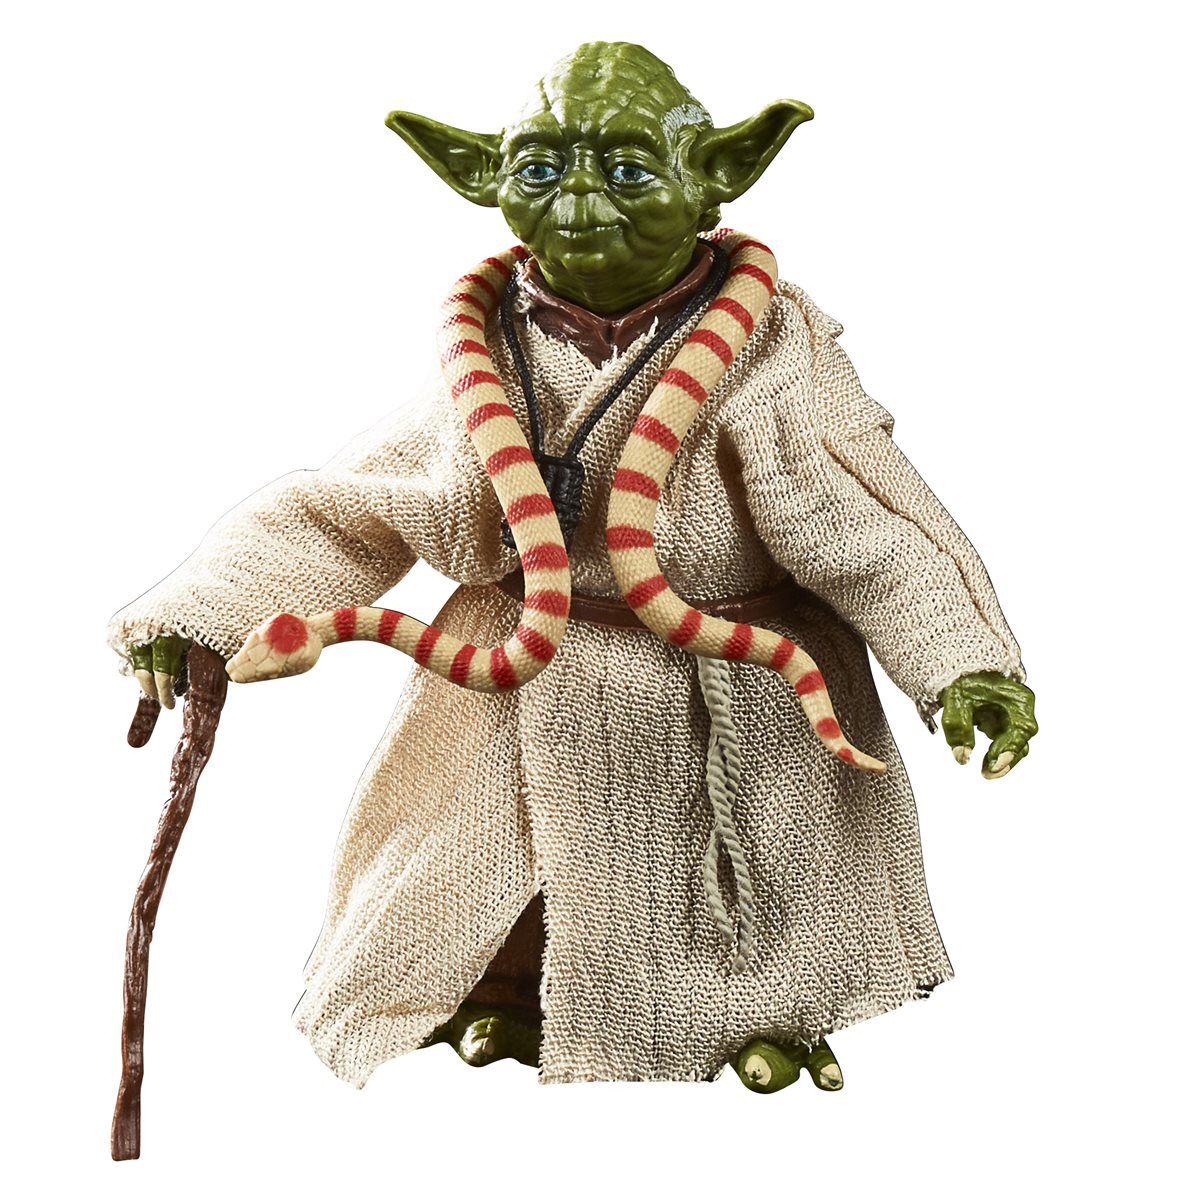 Star Wars 40th Anniversary Empire Stirkes Back Yoda NEW